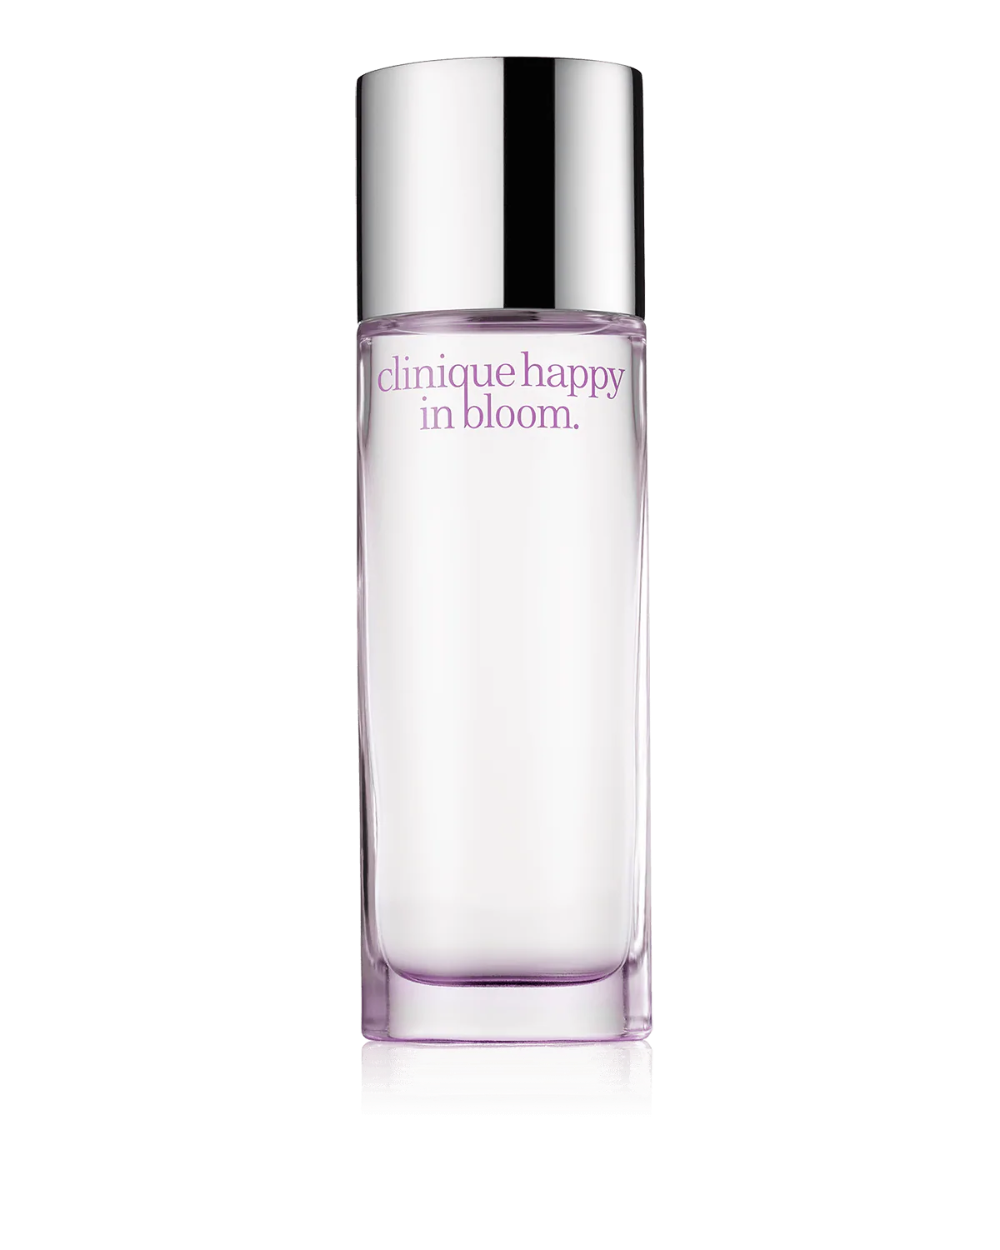 Clinique Happy In Bloom Perfume Clinique Perfume Clinique Wedding Fragrance